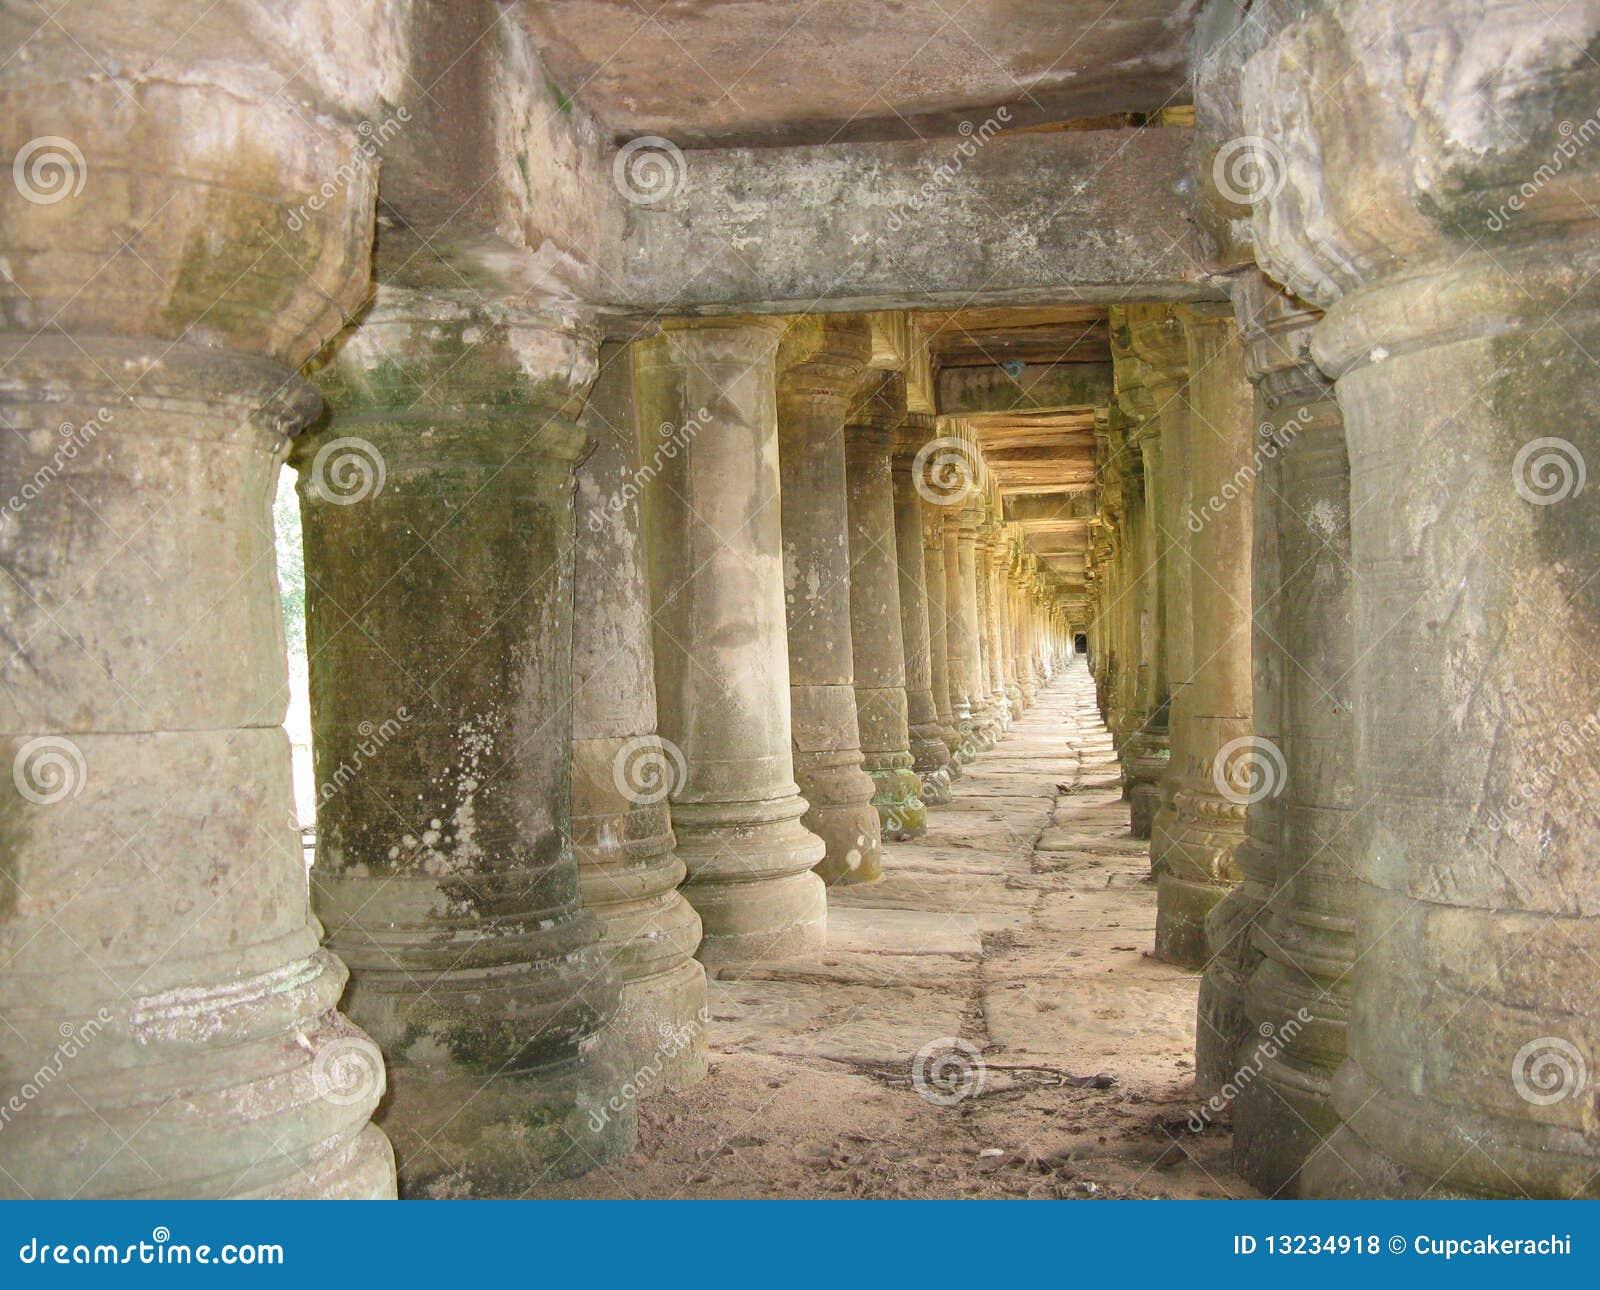 Ancient Stone Pillars : Stone pillars stock photo image of ruin ancient ankor